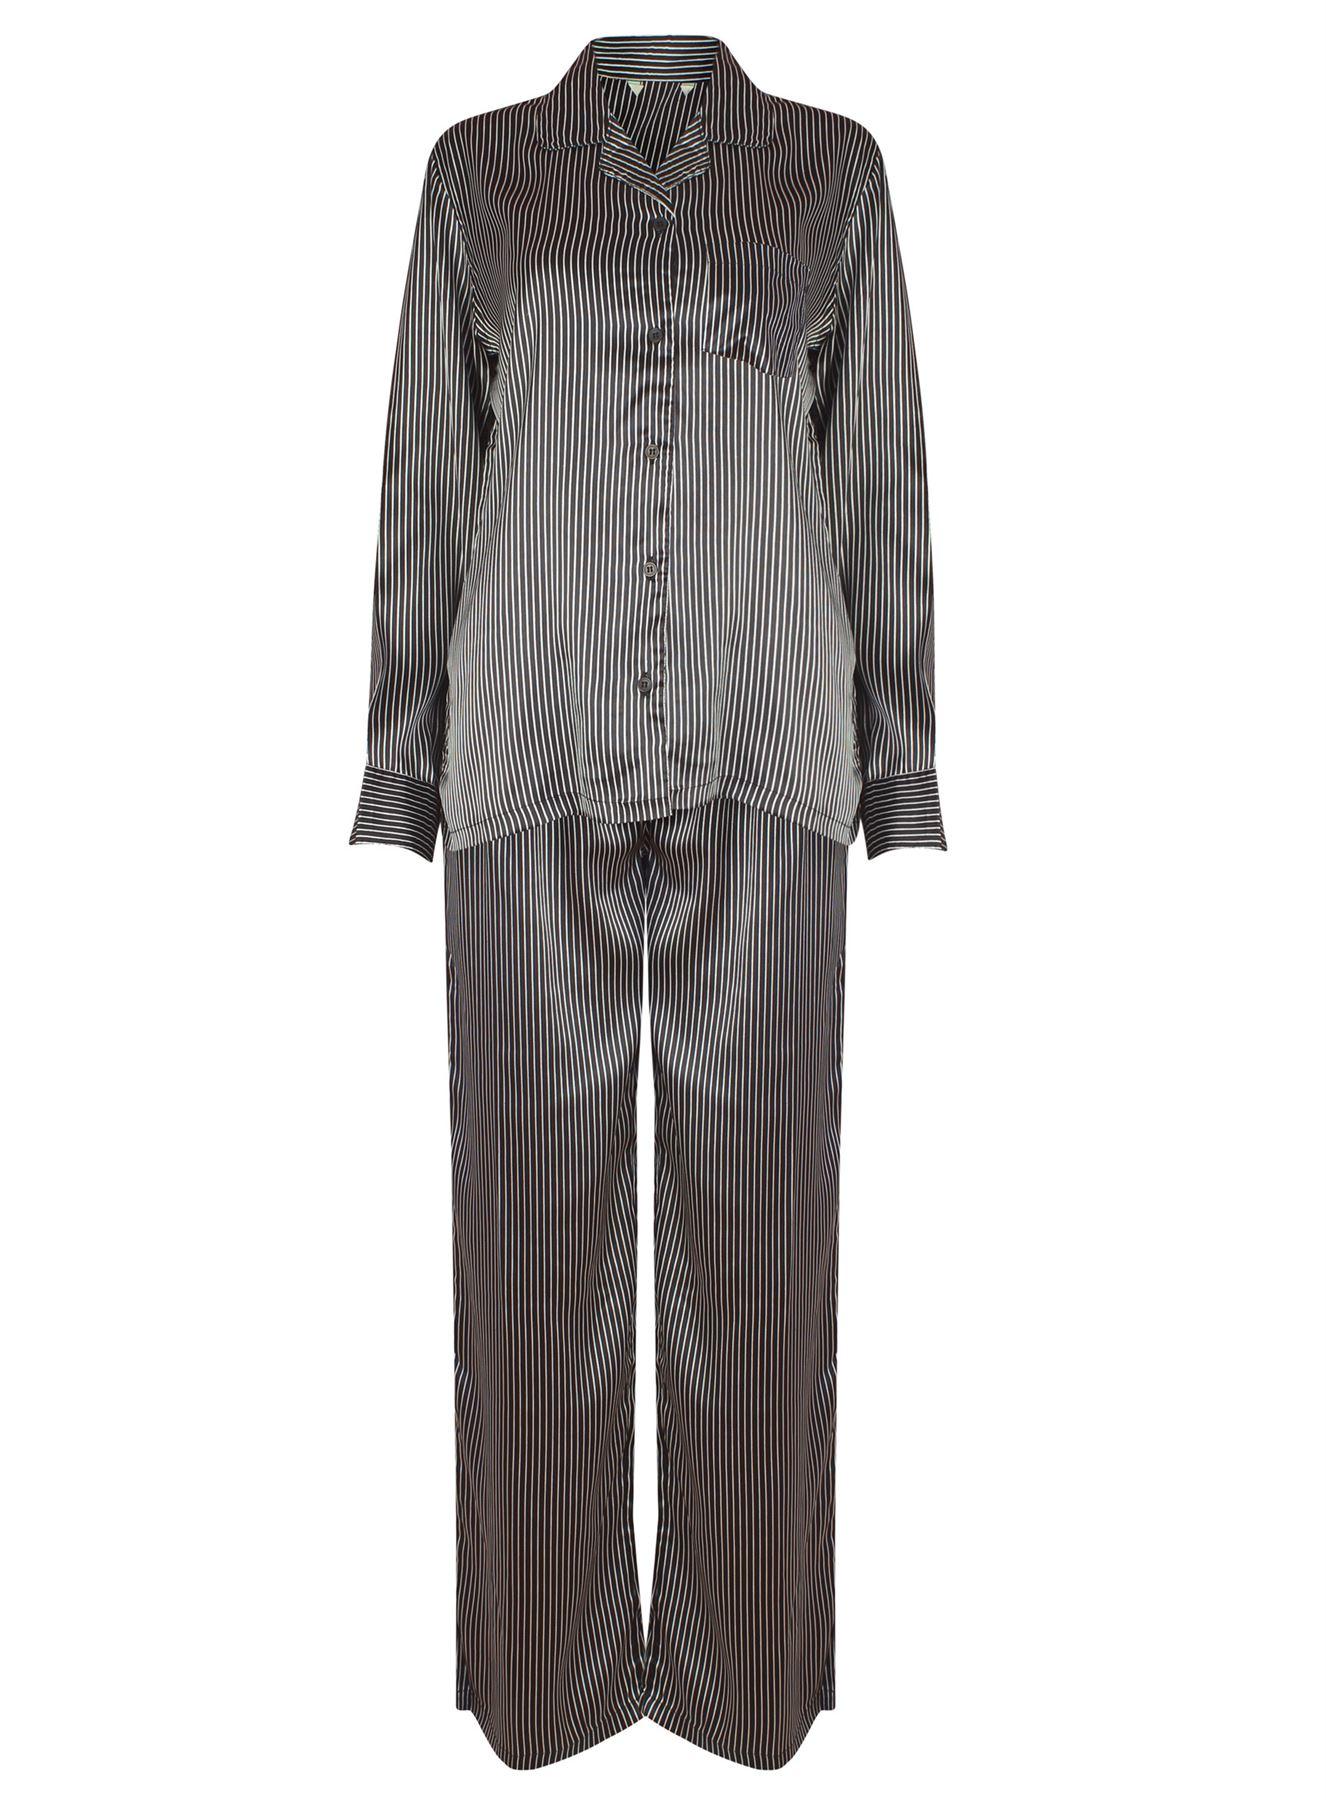 Womens Pyjamas 2pc Black Stripe Satin Revere Long Sleeve PJs Loungewear Set